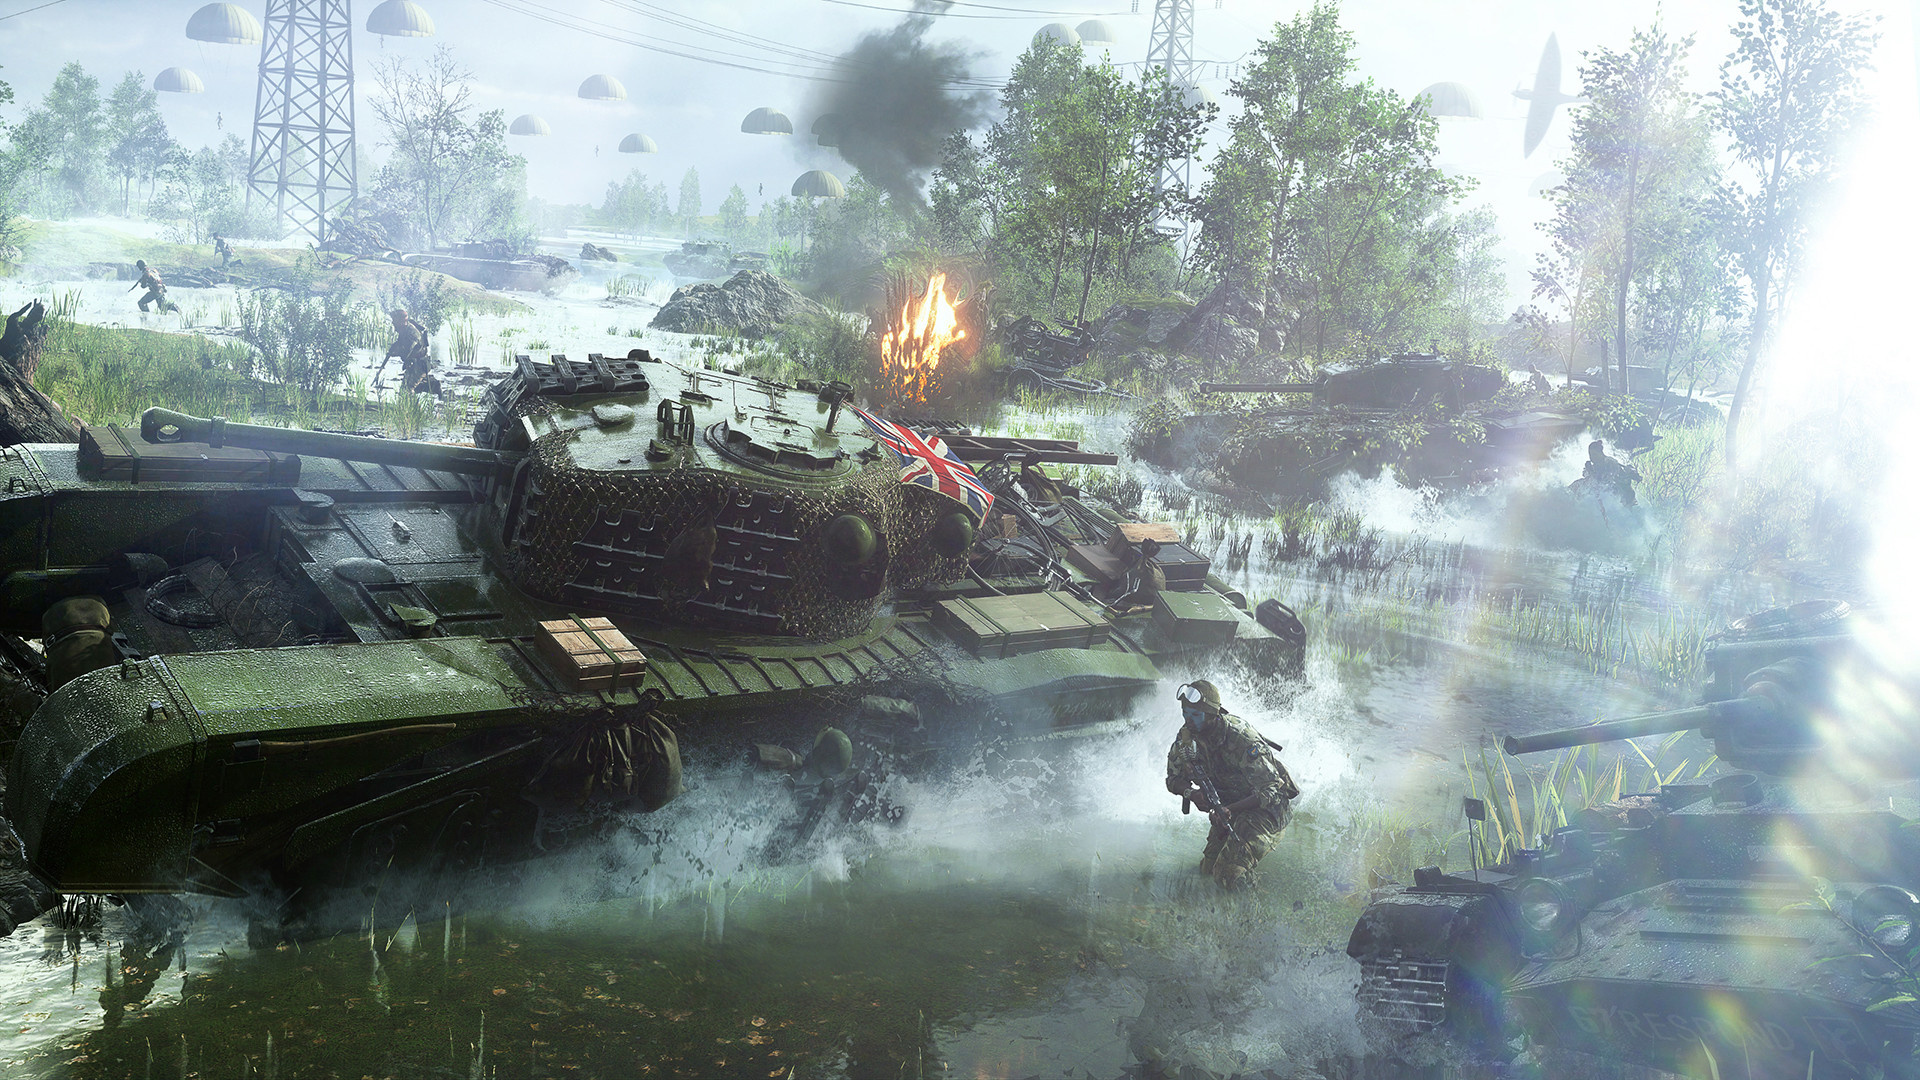 Лучшие новинки Steam за июнь: Battlefield V, Sea of Thieves, Satisfactory и другие